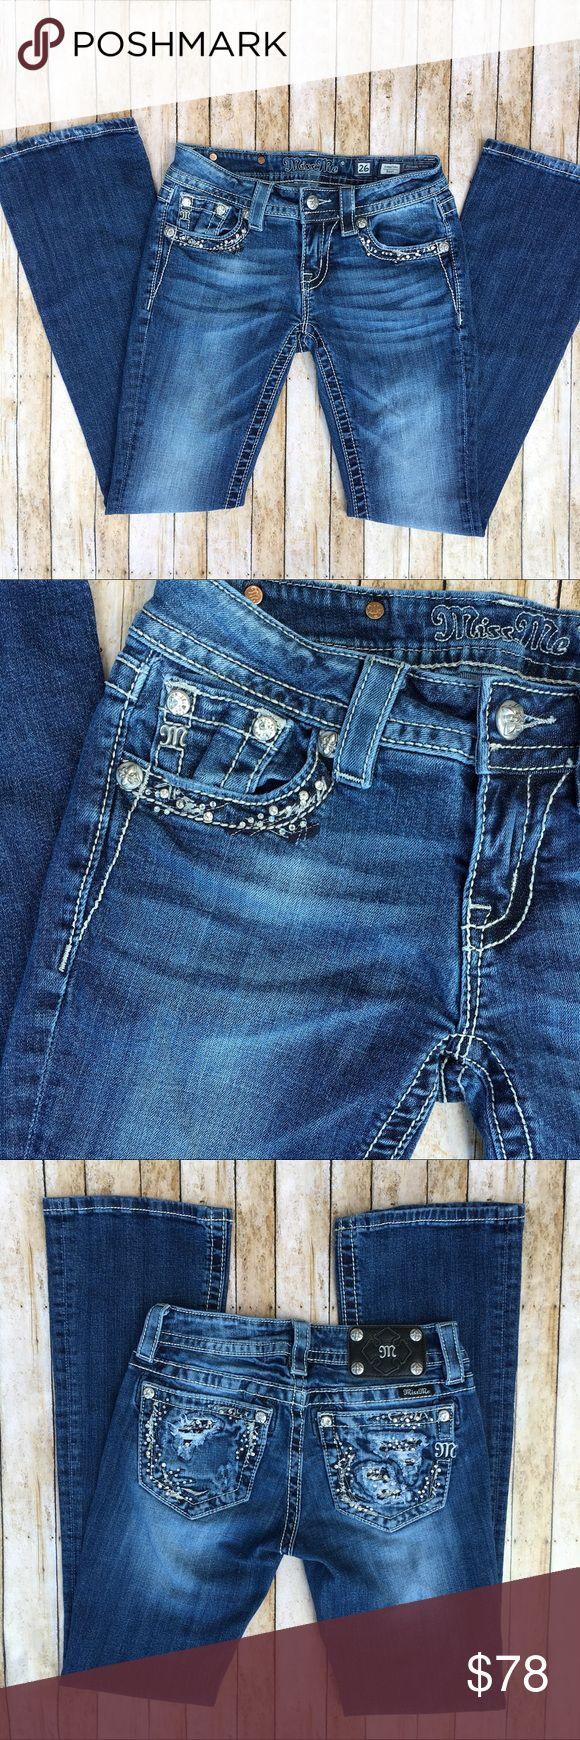 Miss Me Bootcut Jeans Miss Me Bootcut Jeans. Size 26 Inseam 32 Miss Me Jeans Boot Cut